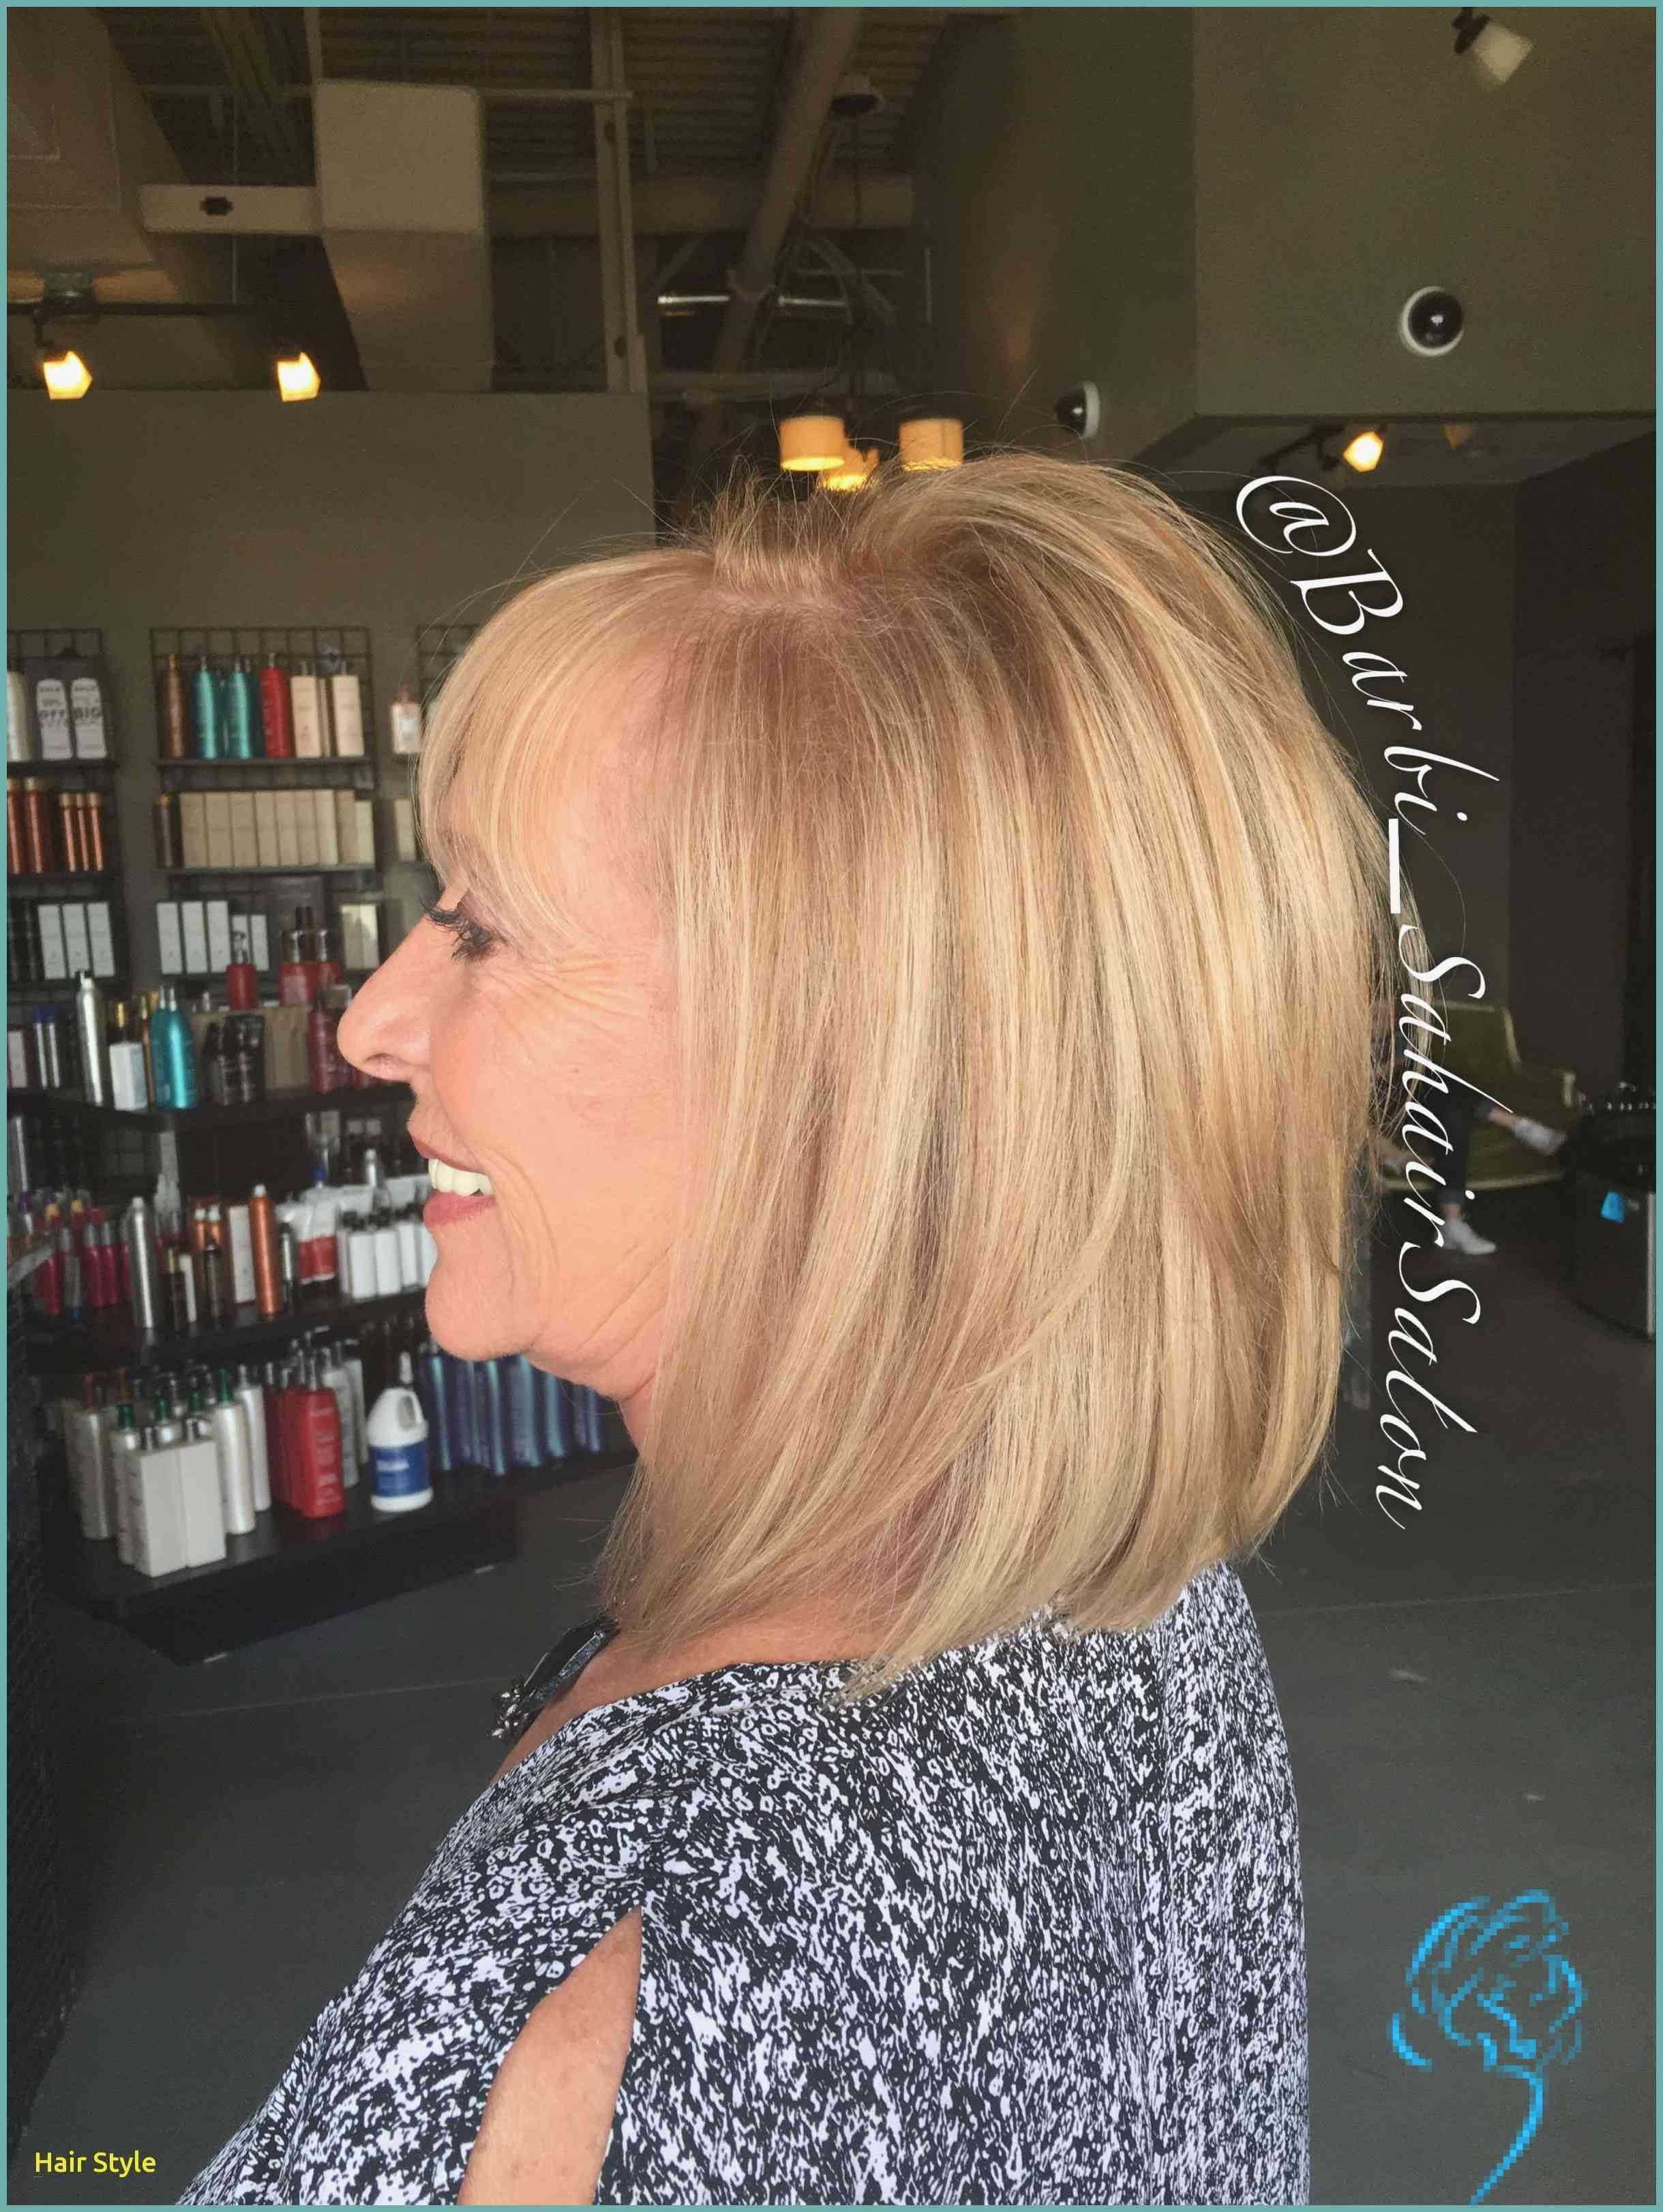 Schone Frisur Madchen 2019 Haartrends 2018 Pinterest Hair